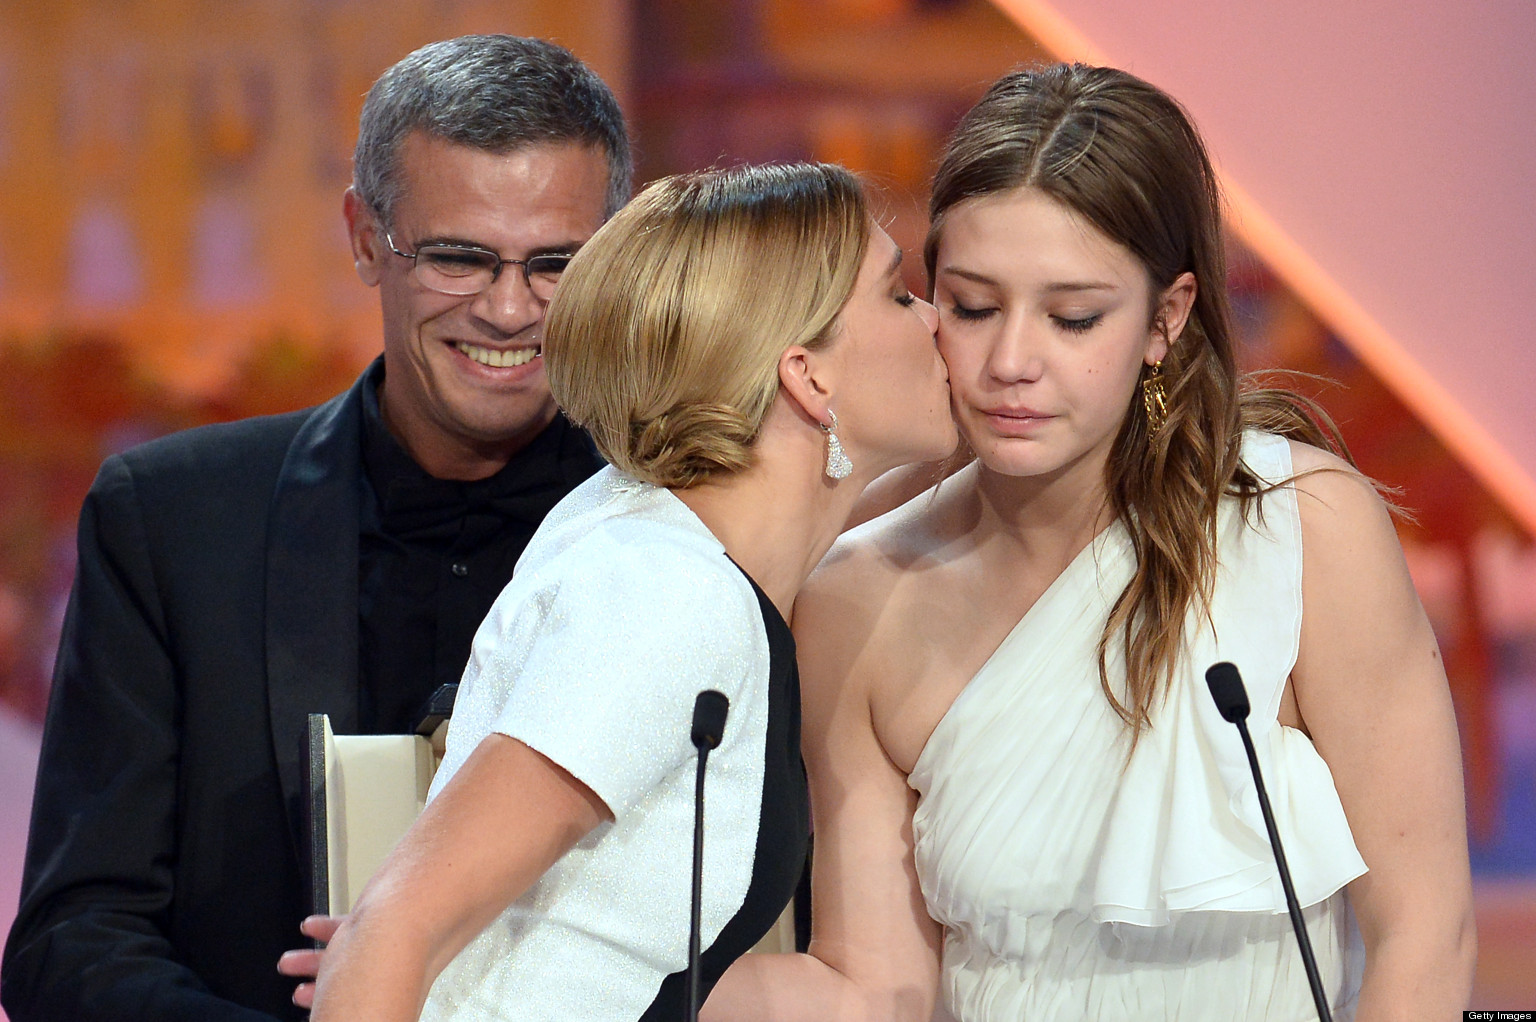 Blue Is The Warmest Color\' & Cannes: Film Wins Palme d\'Or Award ...